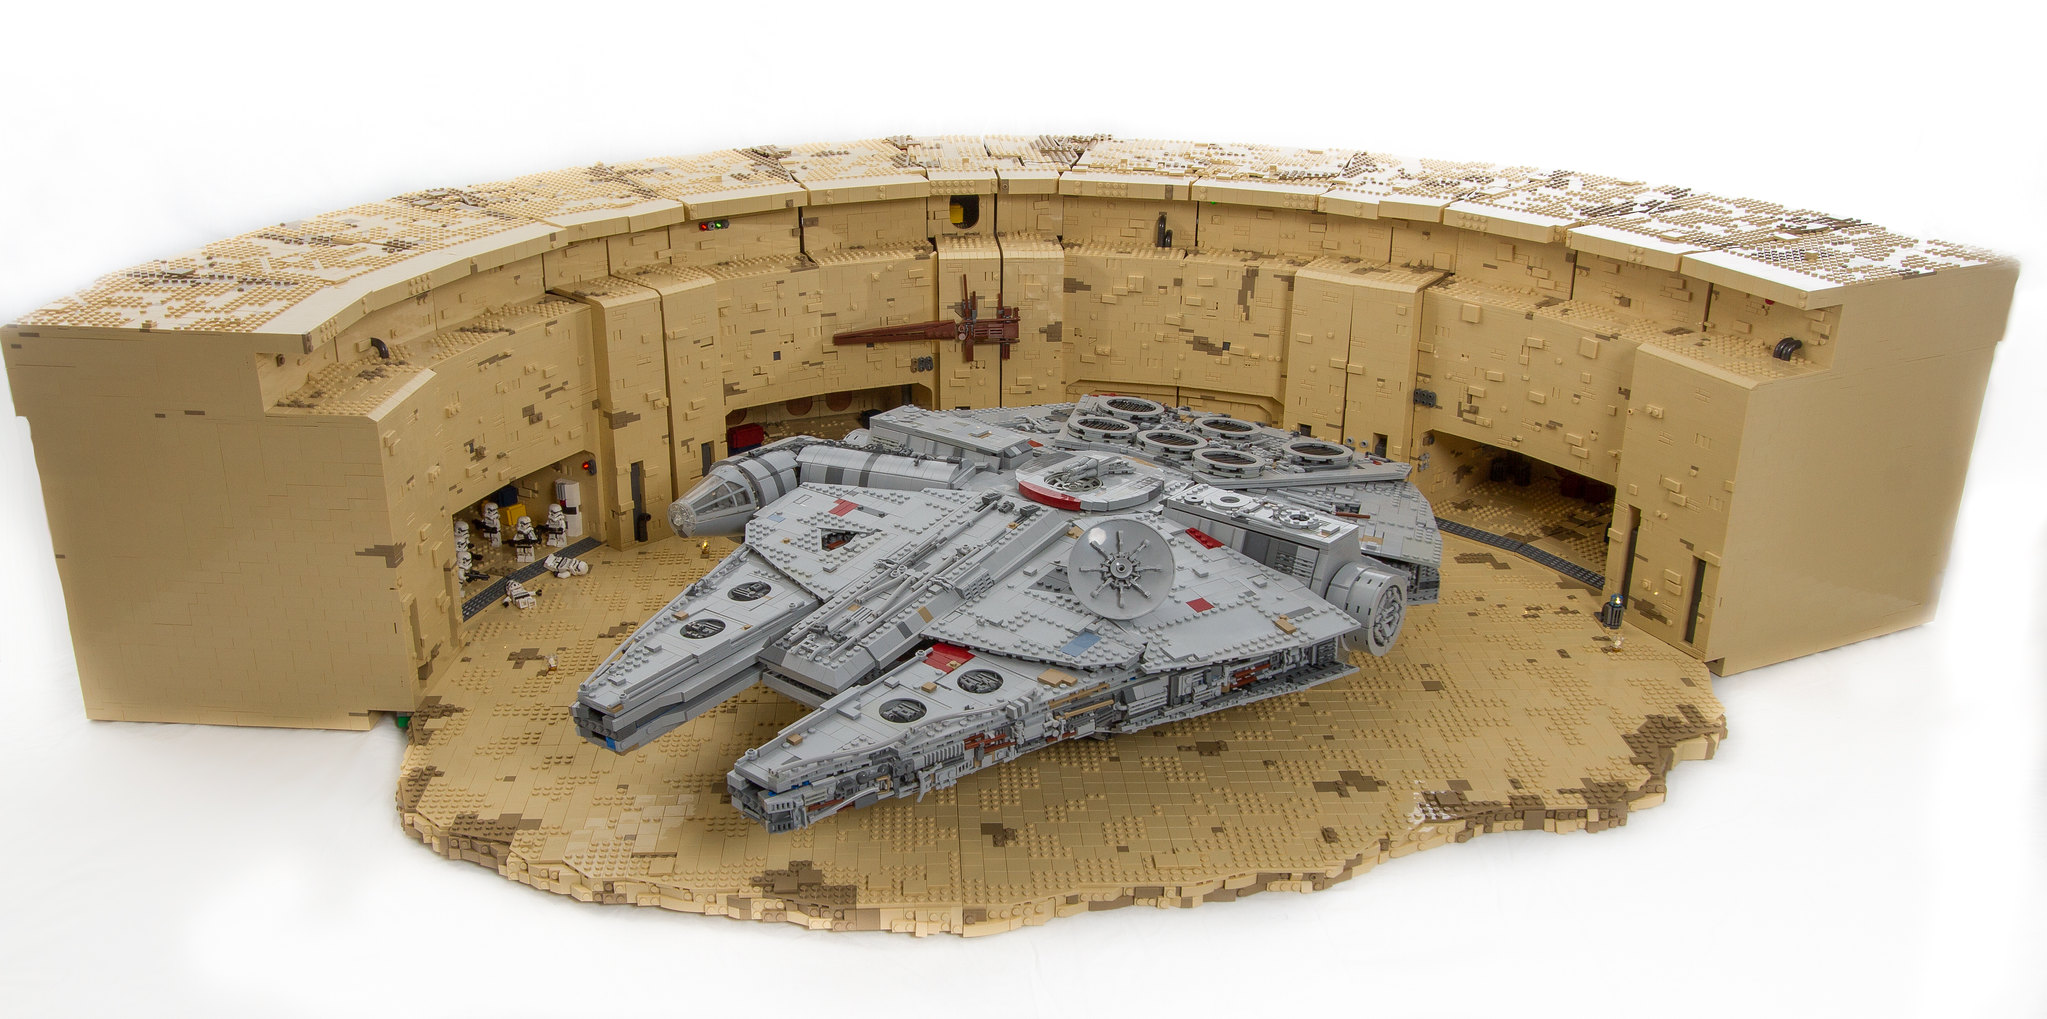 lego-layout-tatooine-docking-bay-b94-ucs-millennium-falcon-daniel-ross-flickr zusammengebaut.com